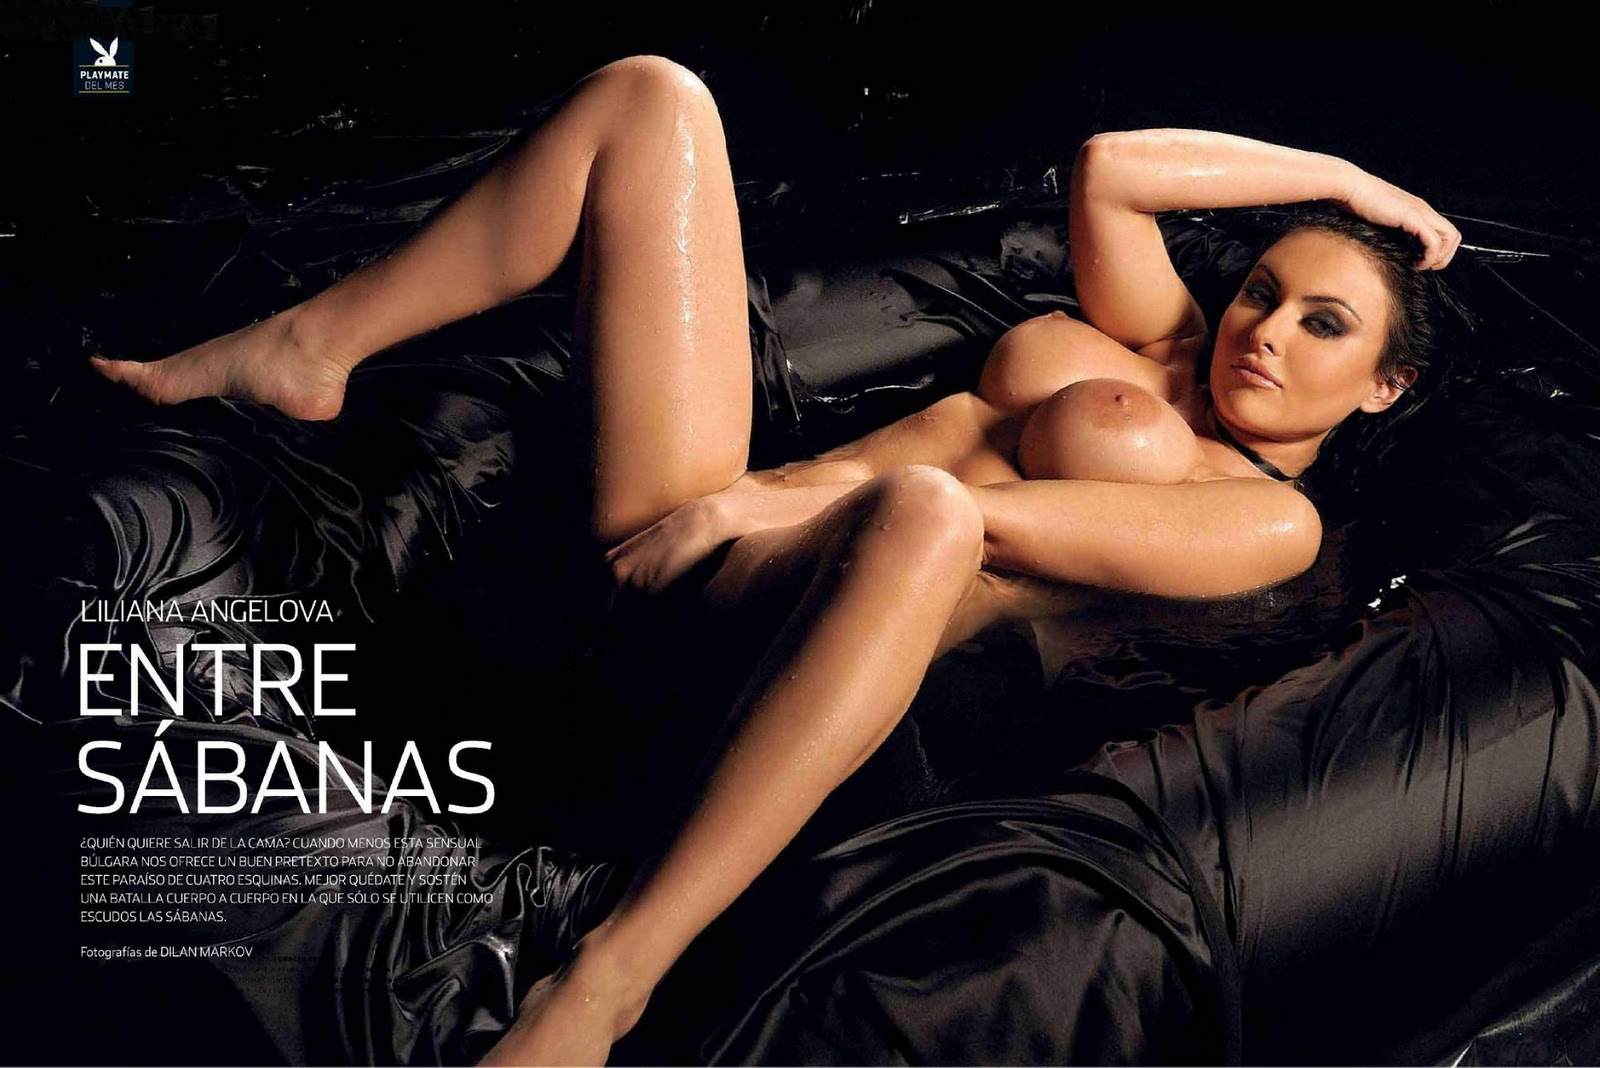 Vanessa james naked pics